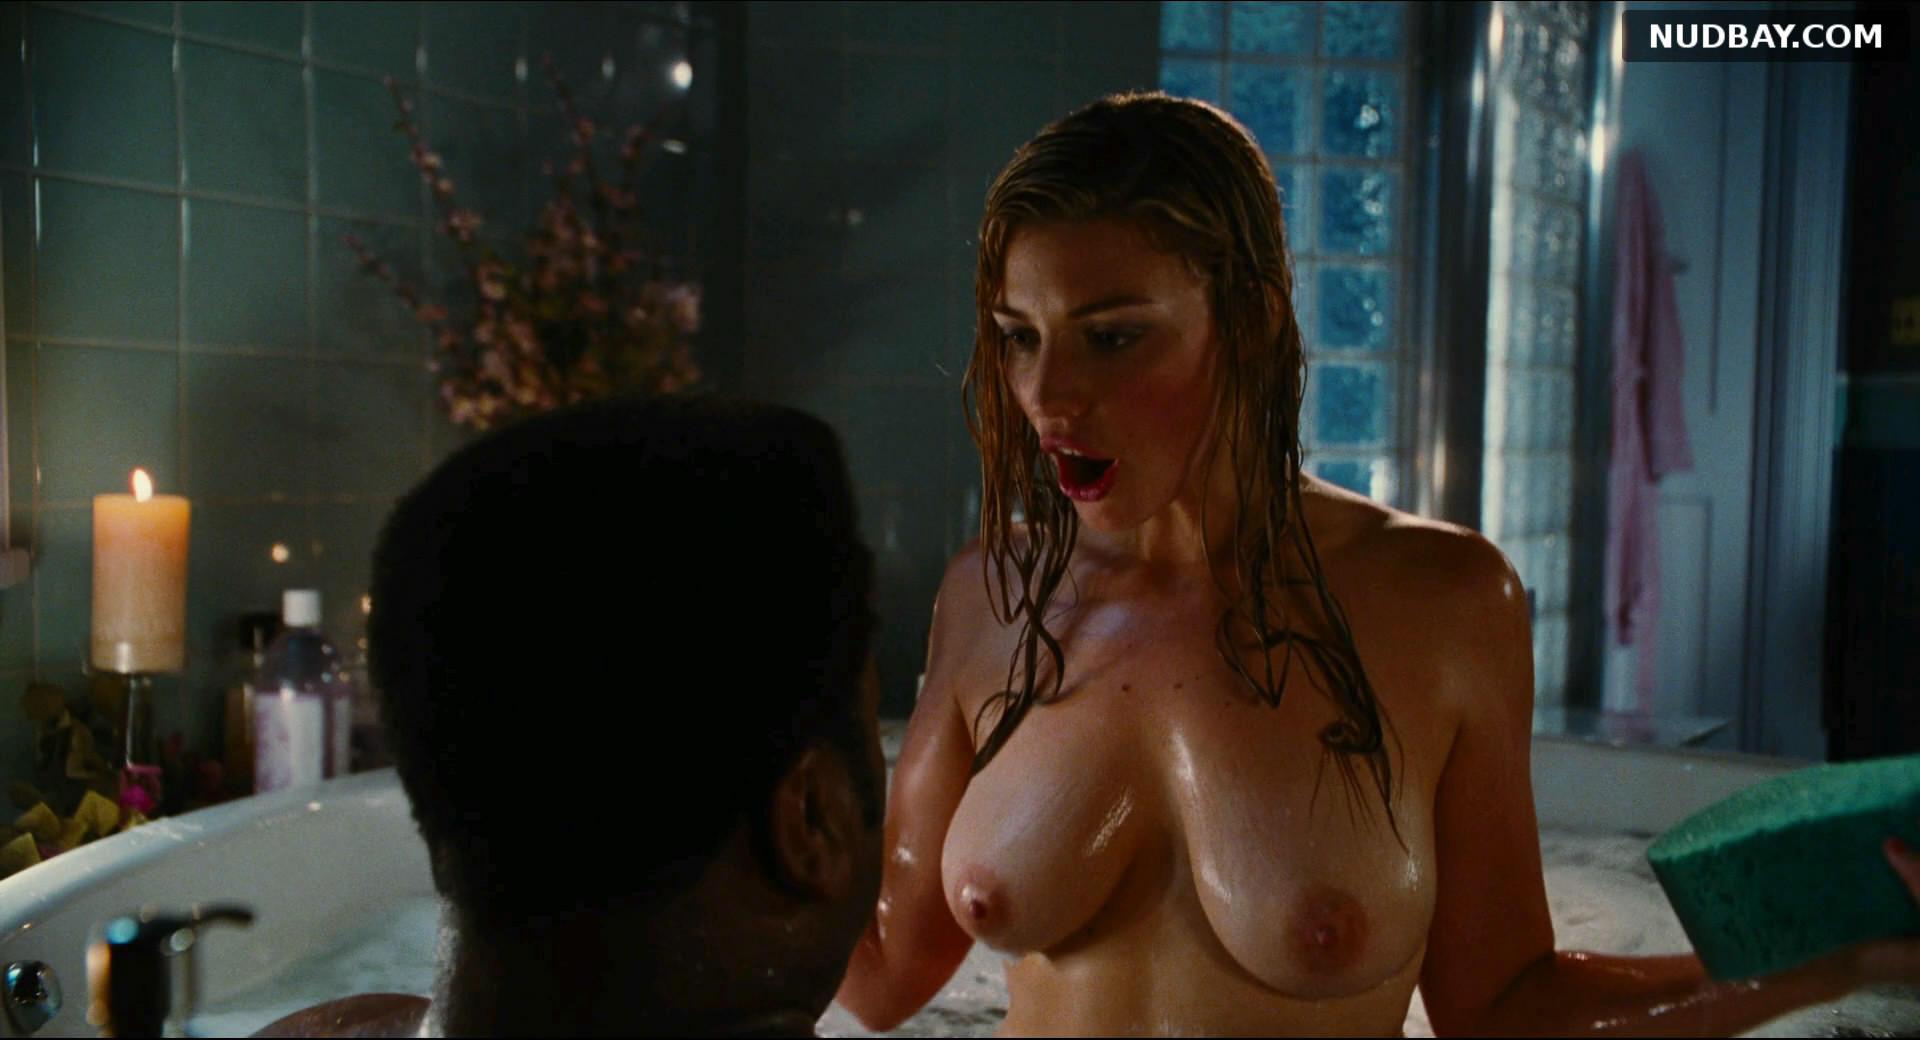 Jessica Pare nude Hot Tub Time Machine (2010)